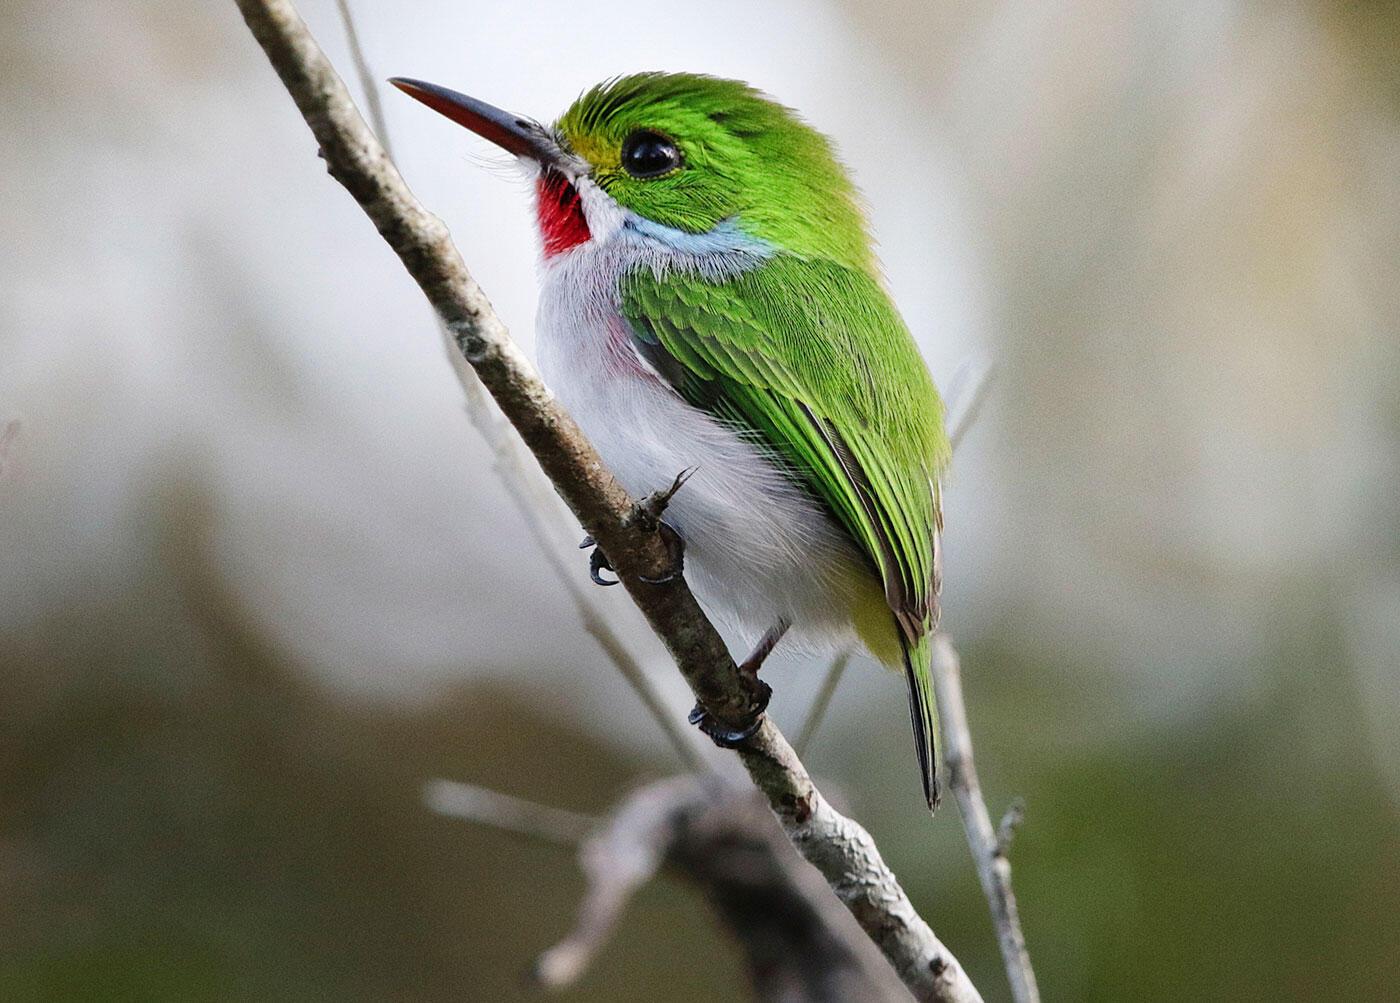 One of Cuba's 28 endemic species, the Cuban Tody. Julia Schmalz